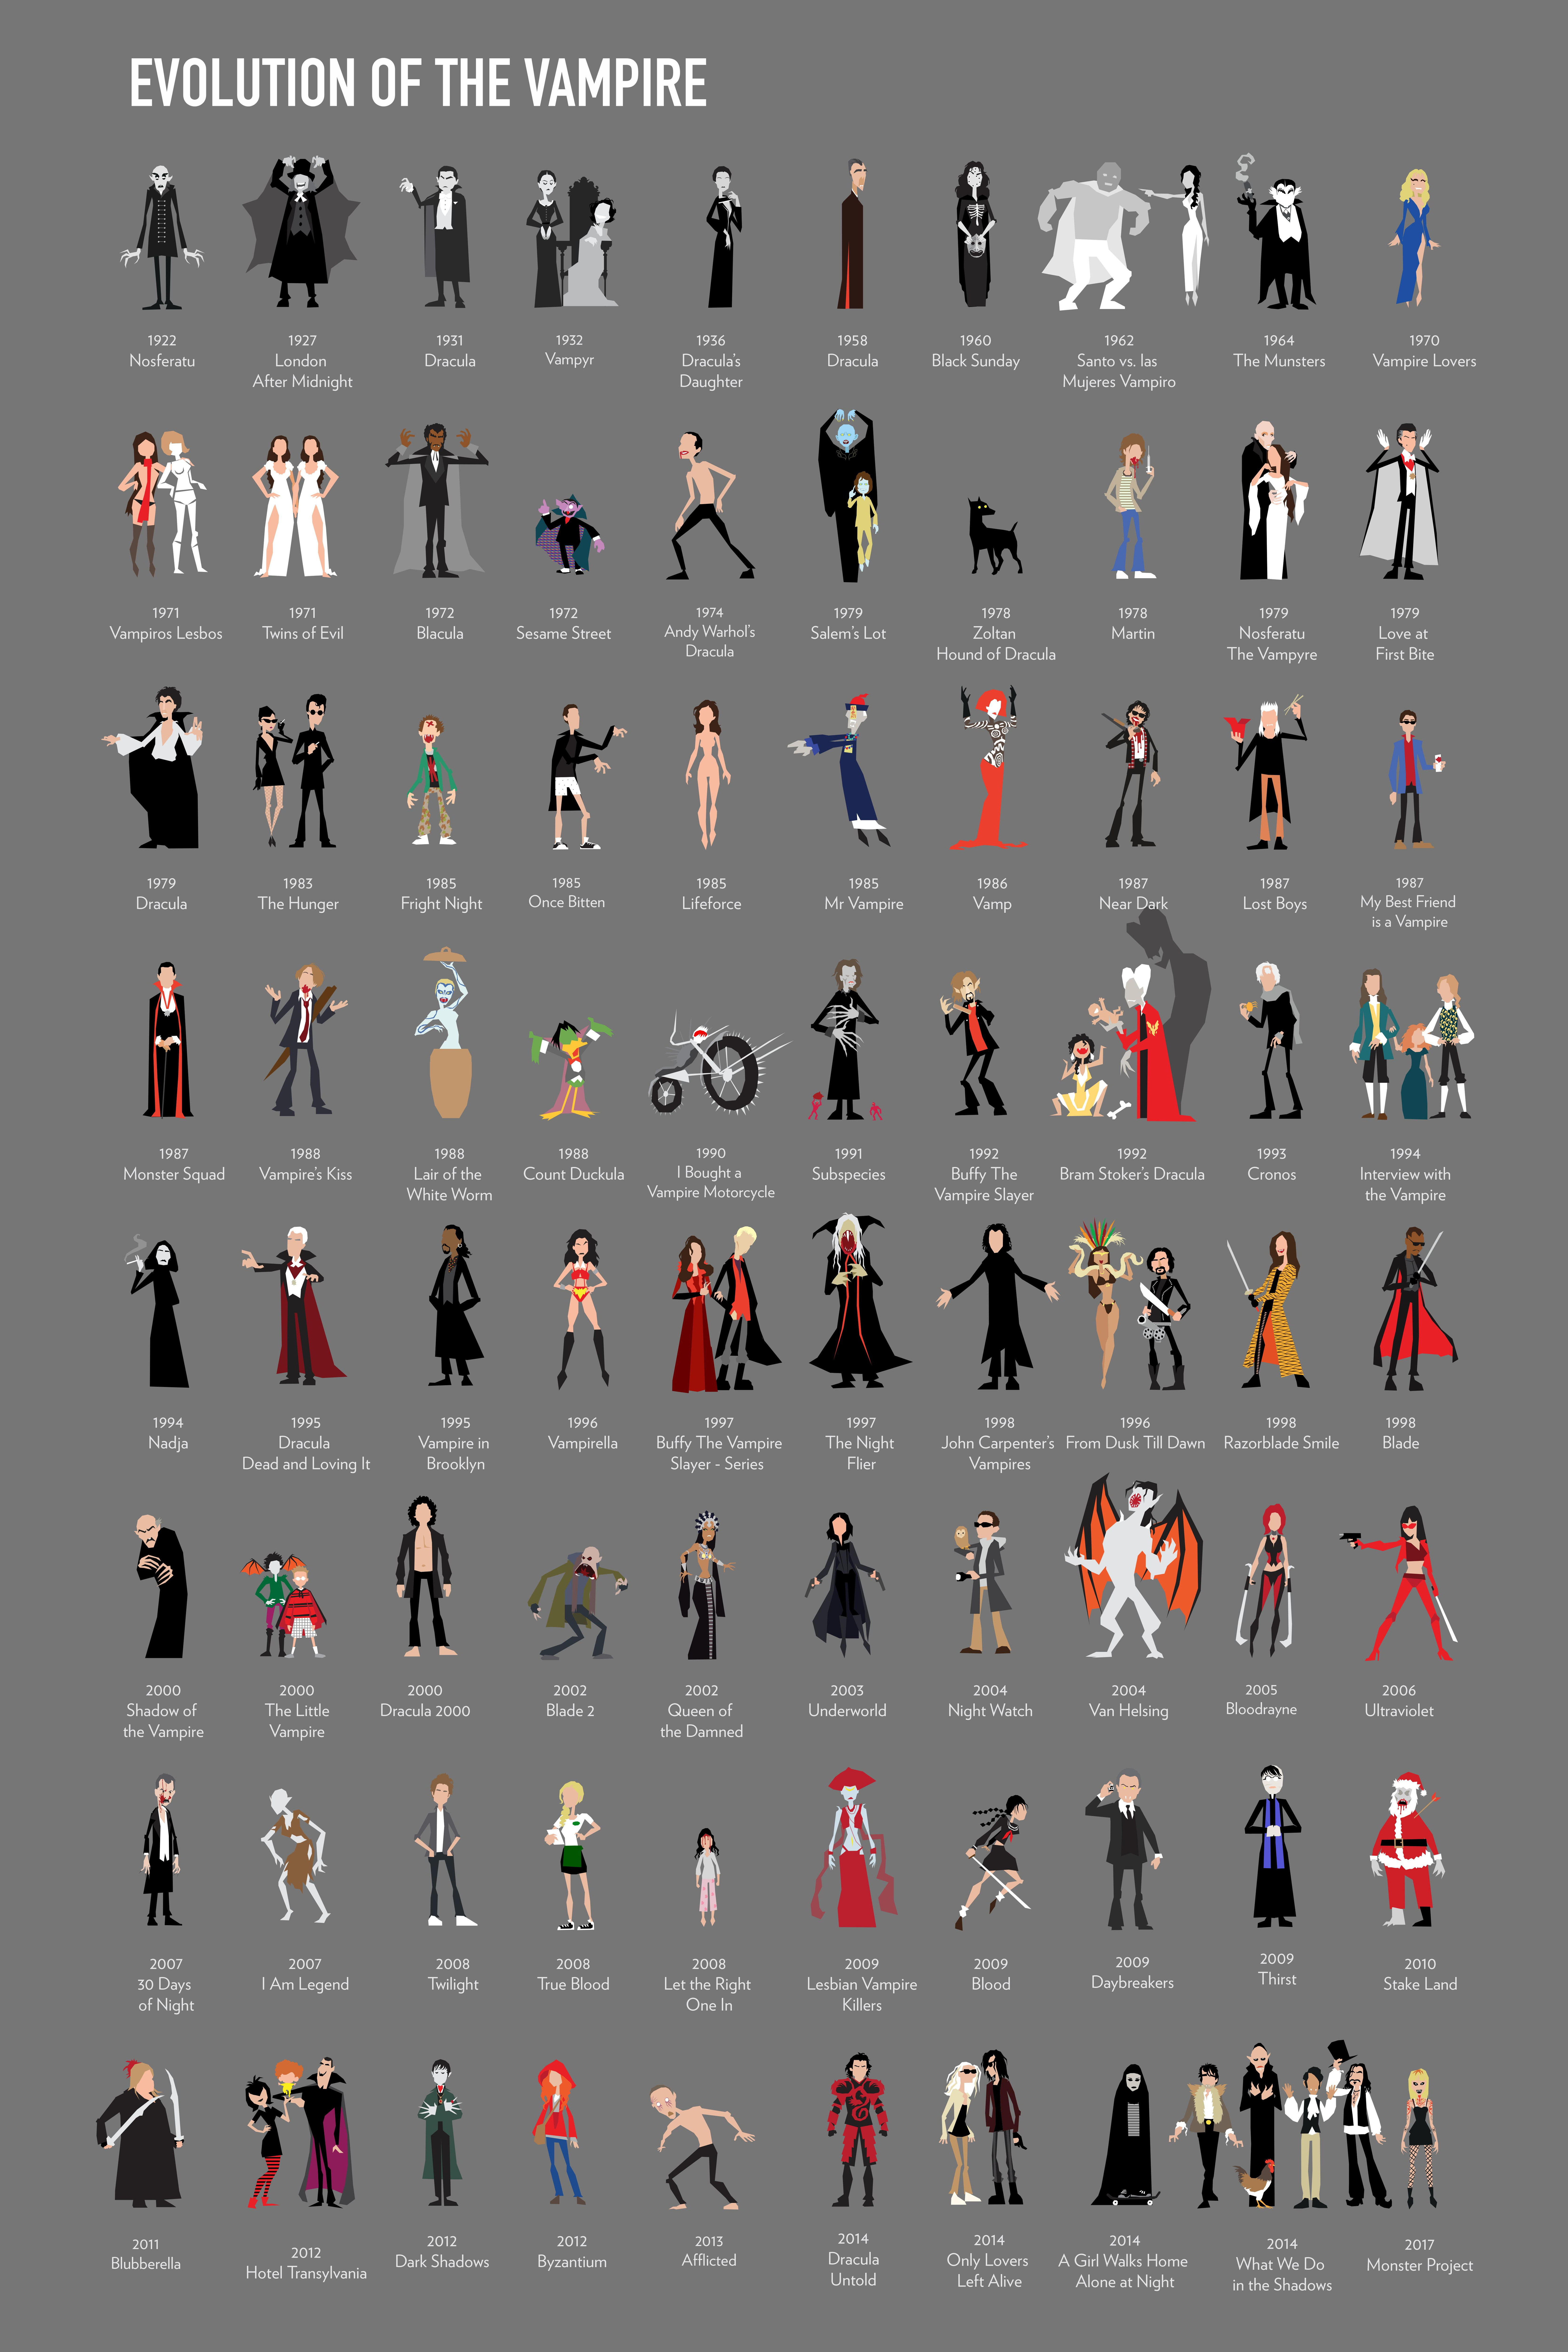 History of the Vampire